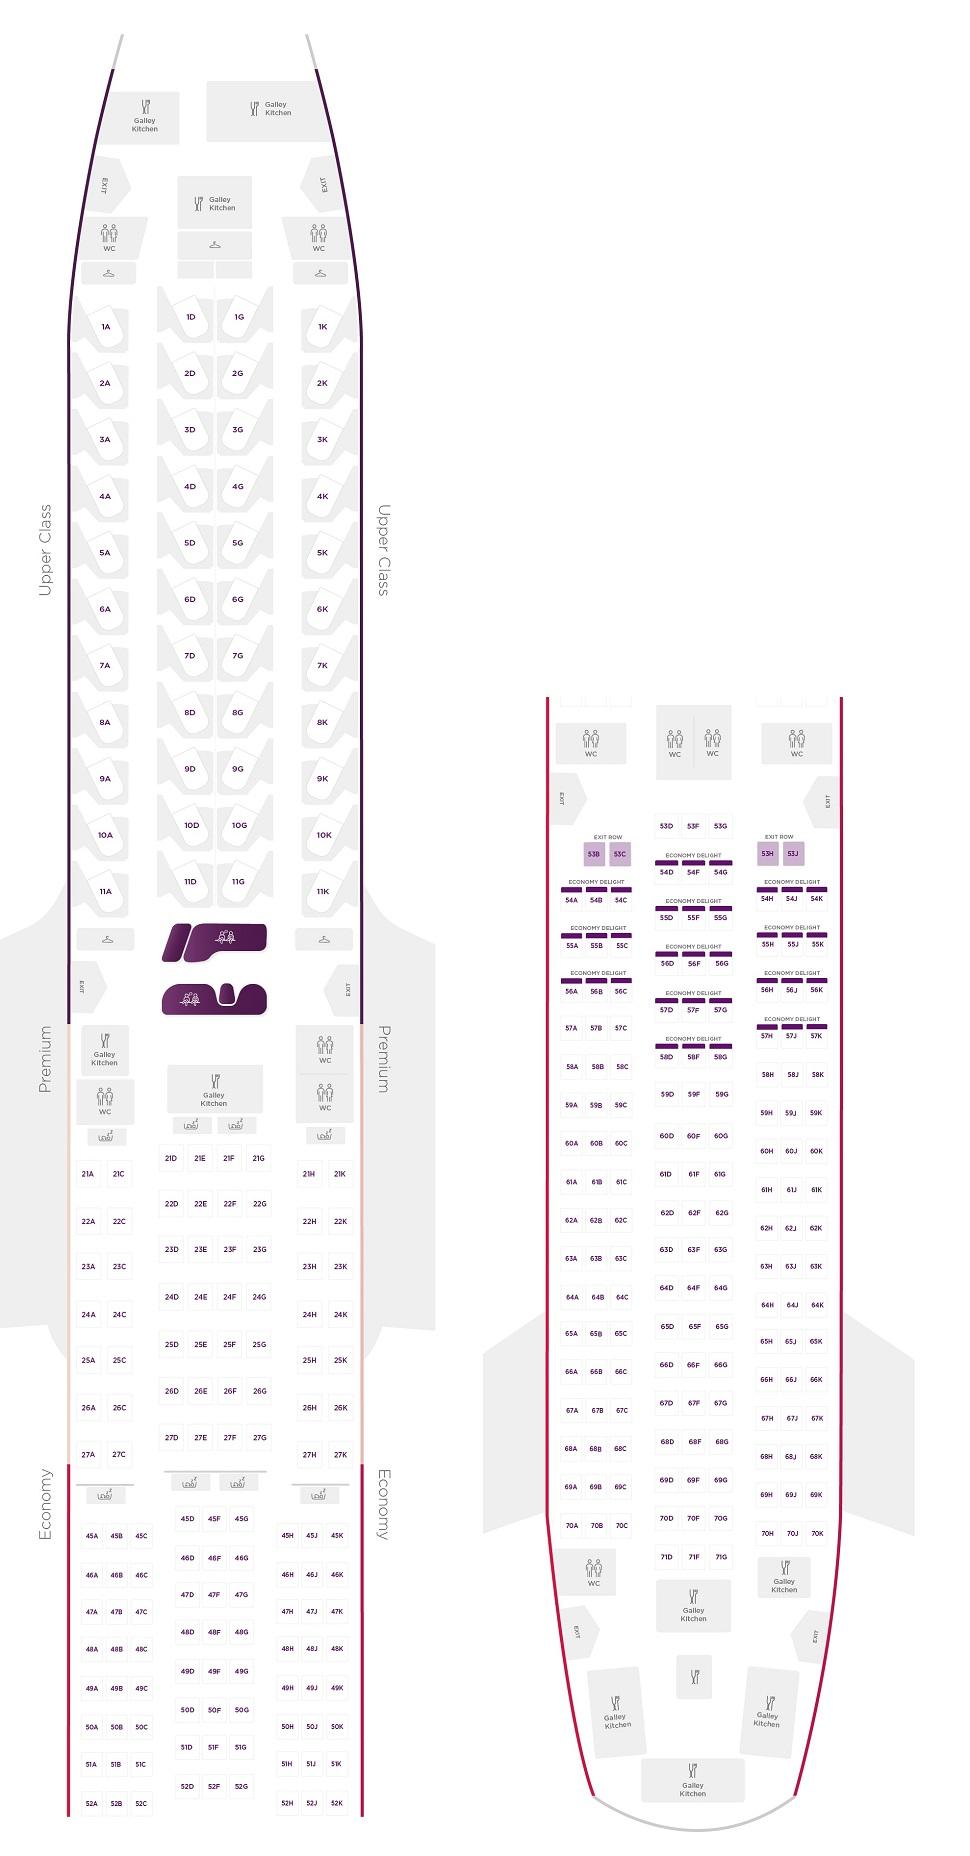 virgin-a350-10000-seat-map-970